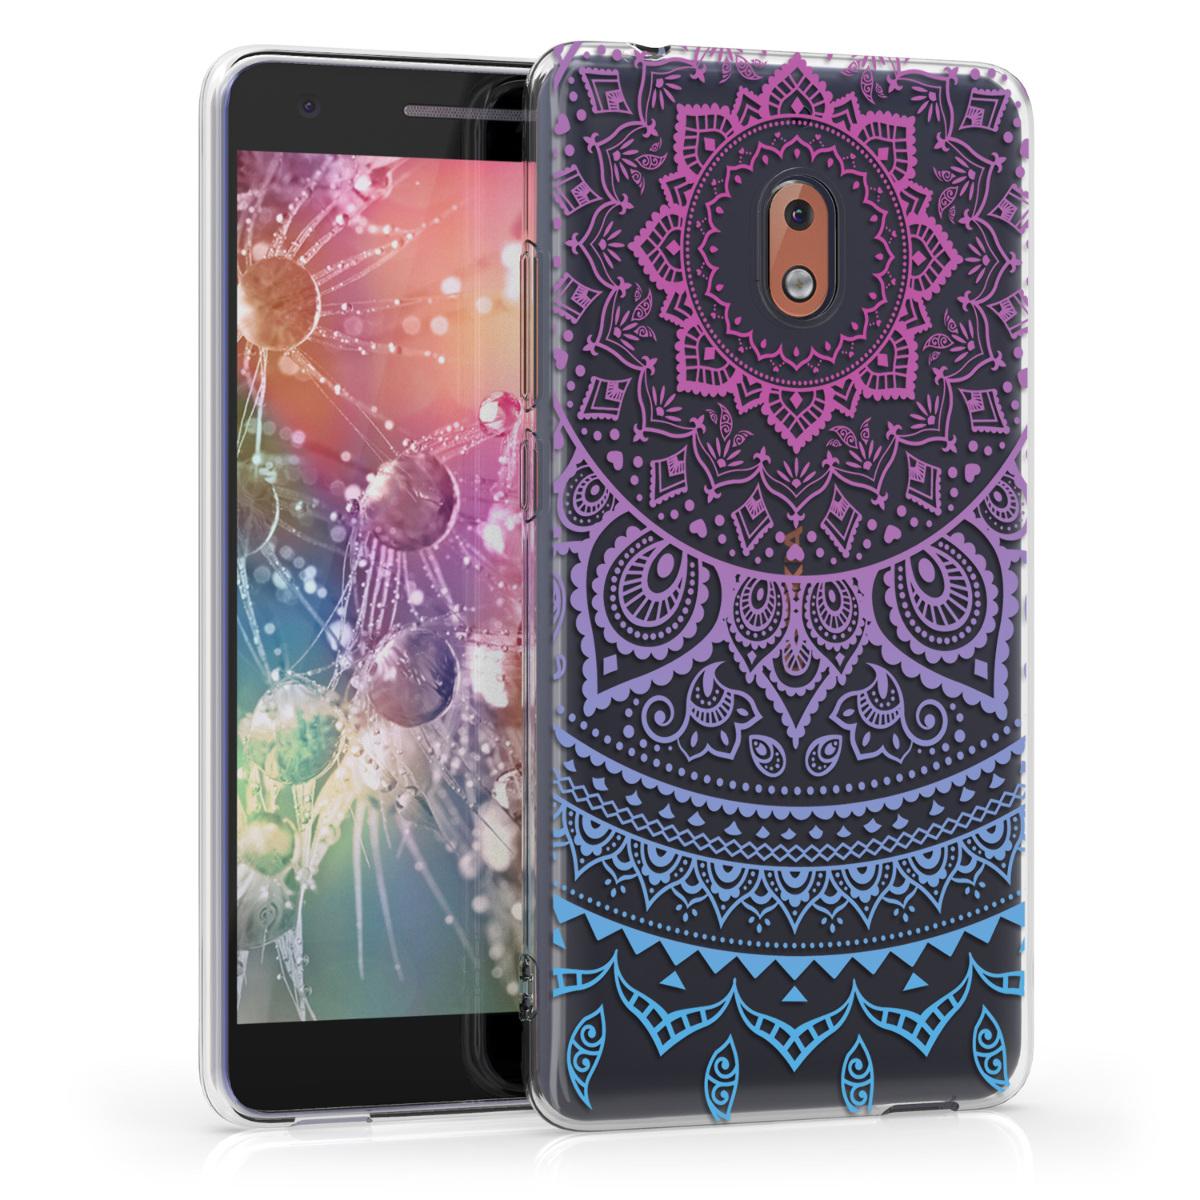 KW Θήκη Σιλικόνης Nokia 2.1 - Crystal Clear - Blue / Dark Pink / Transparent (45386.05)